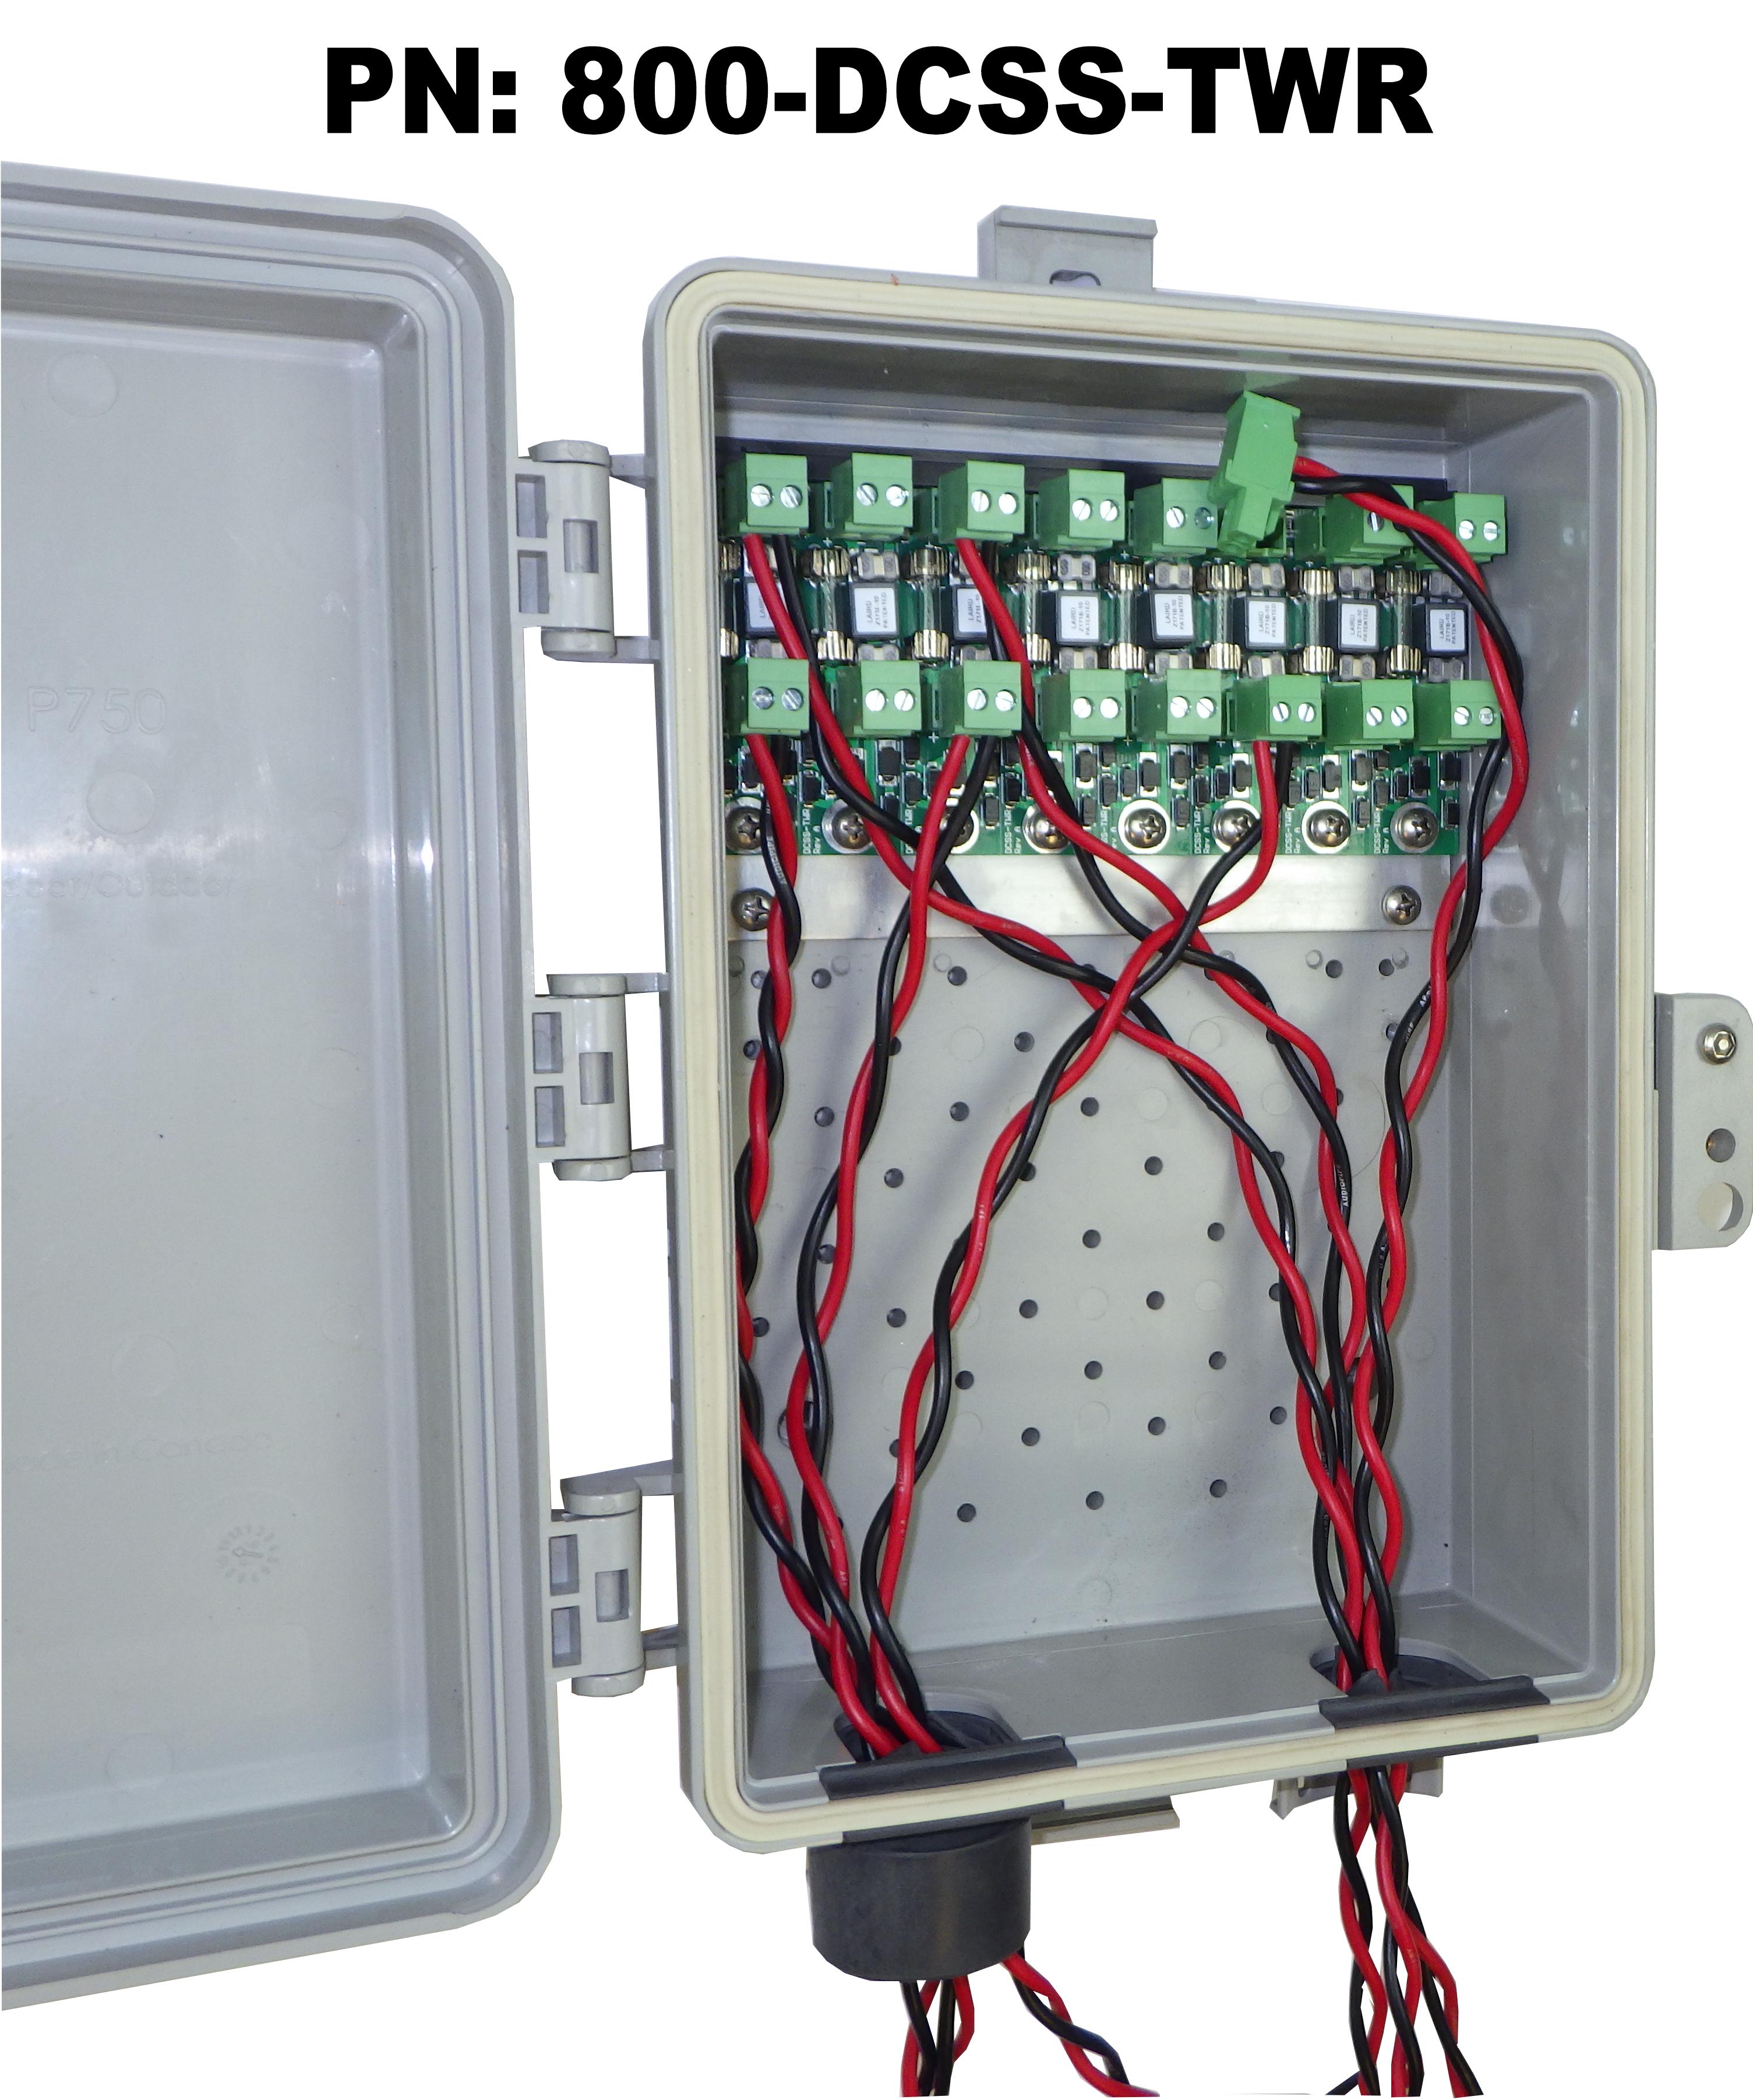 8 Circuit DC Surge Protector